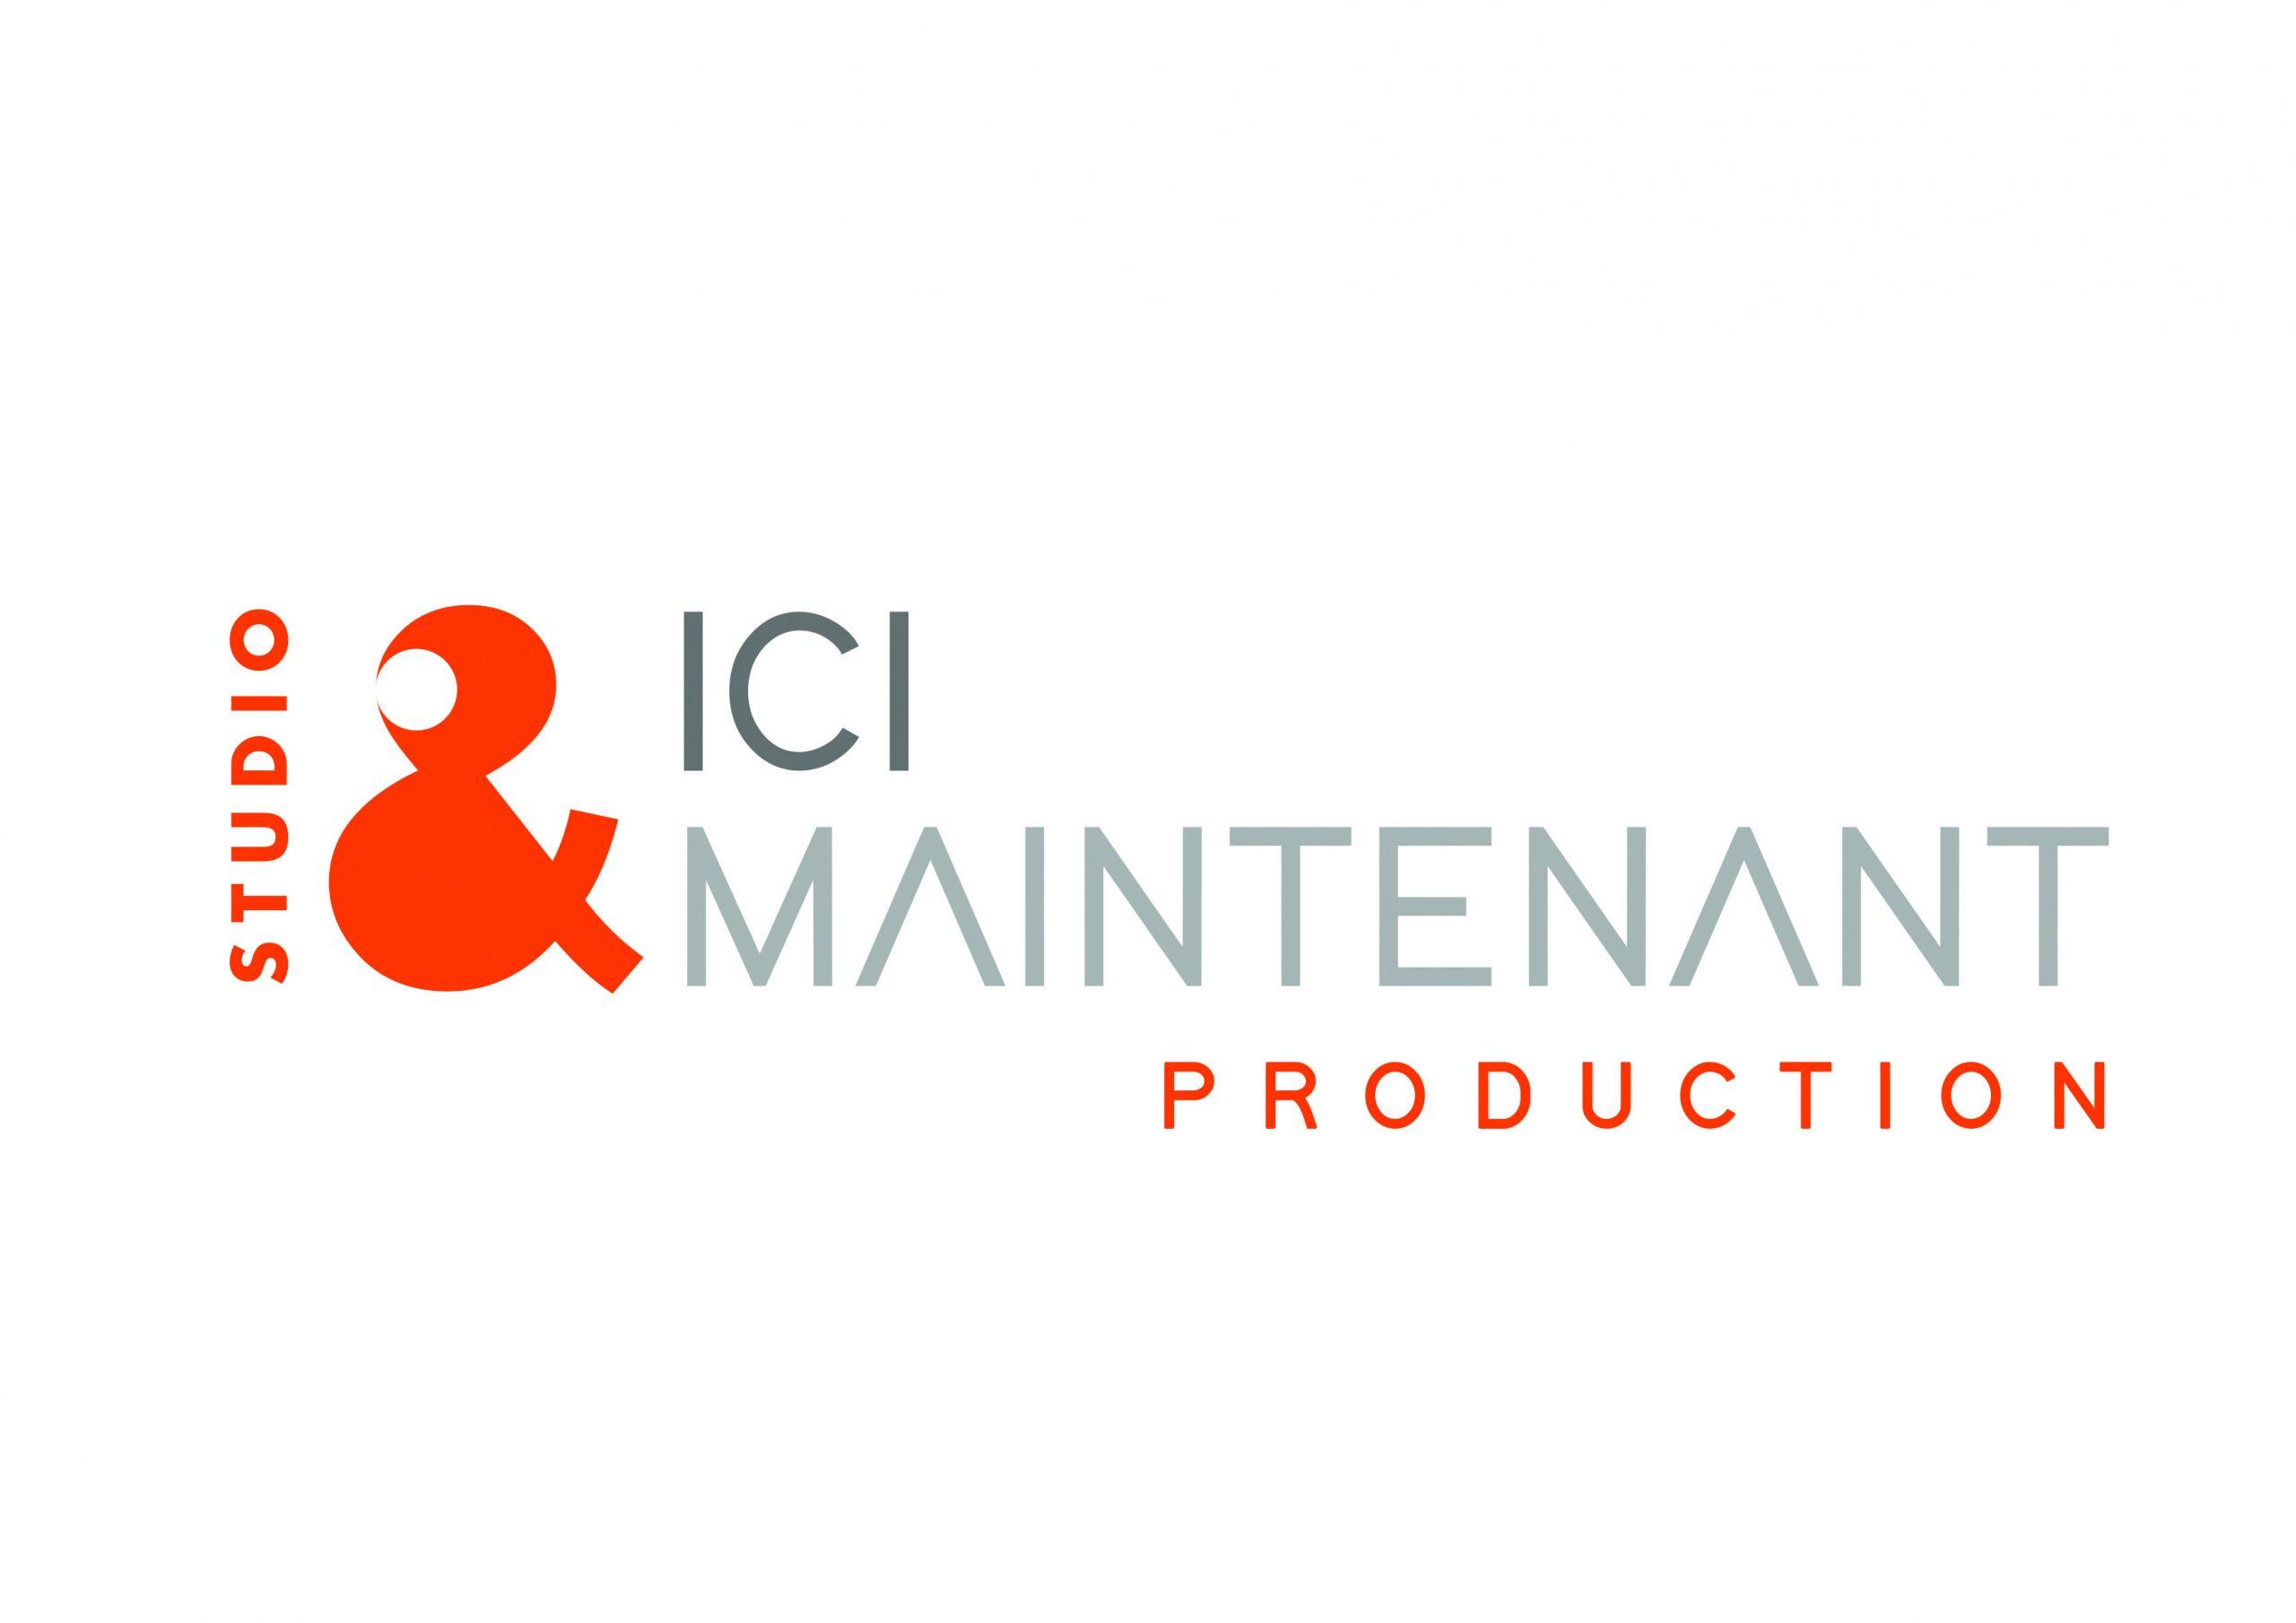 ICI & MAINTENANT